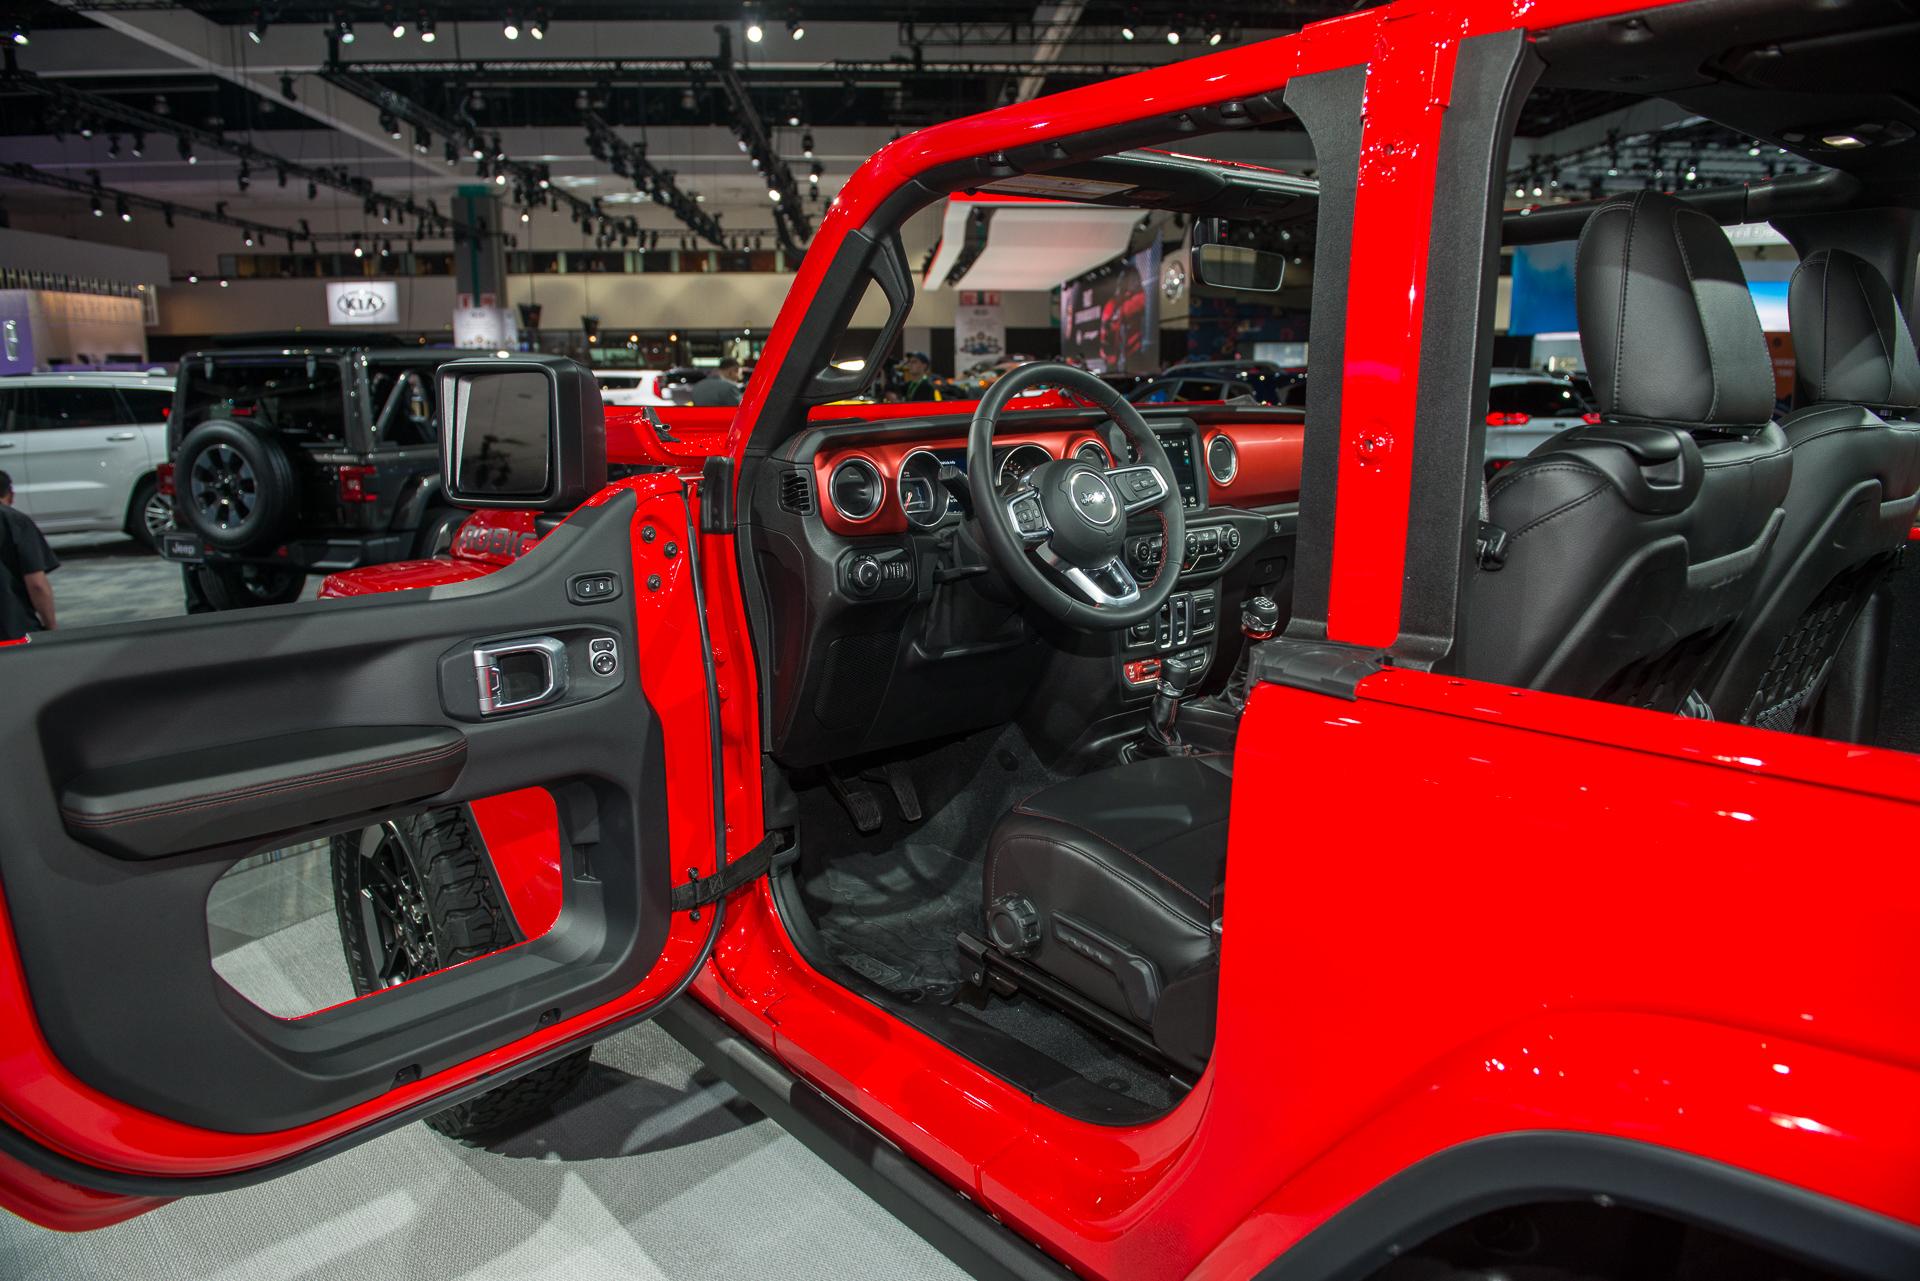 Jeep Wrangler JL donut doors no longer confirmed for 2019